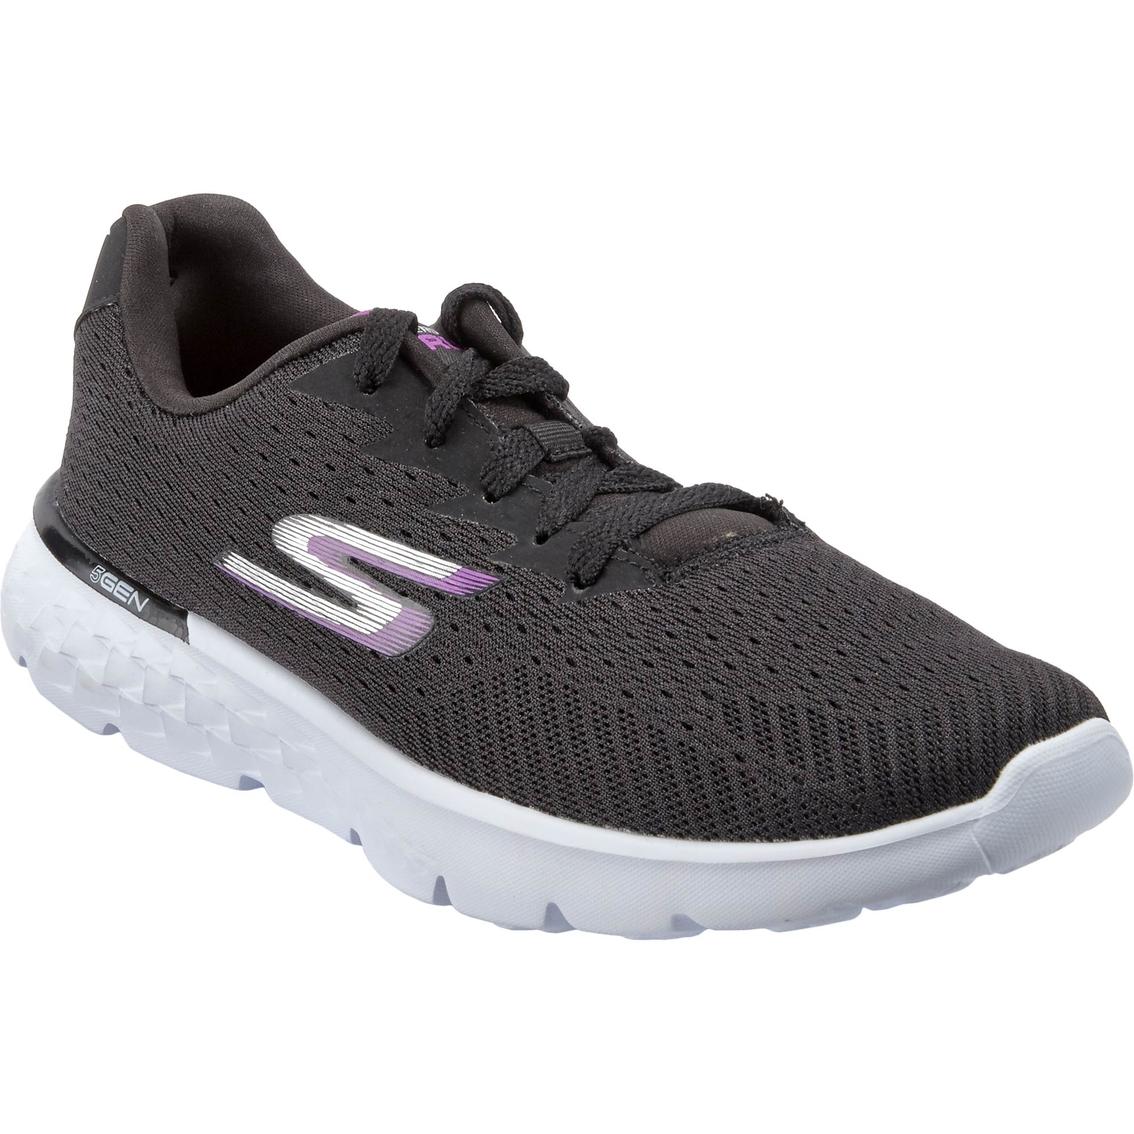 ff01ffbf13e642 Skechers Womens Go Run 400 Sole Running Shoes